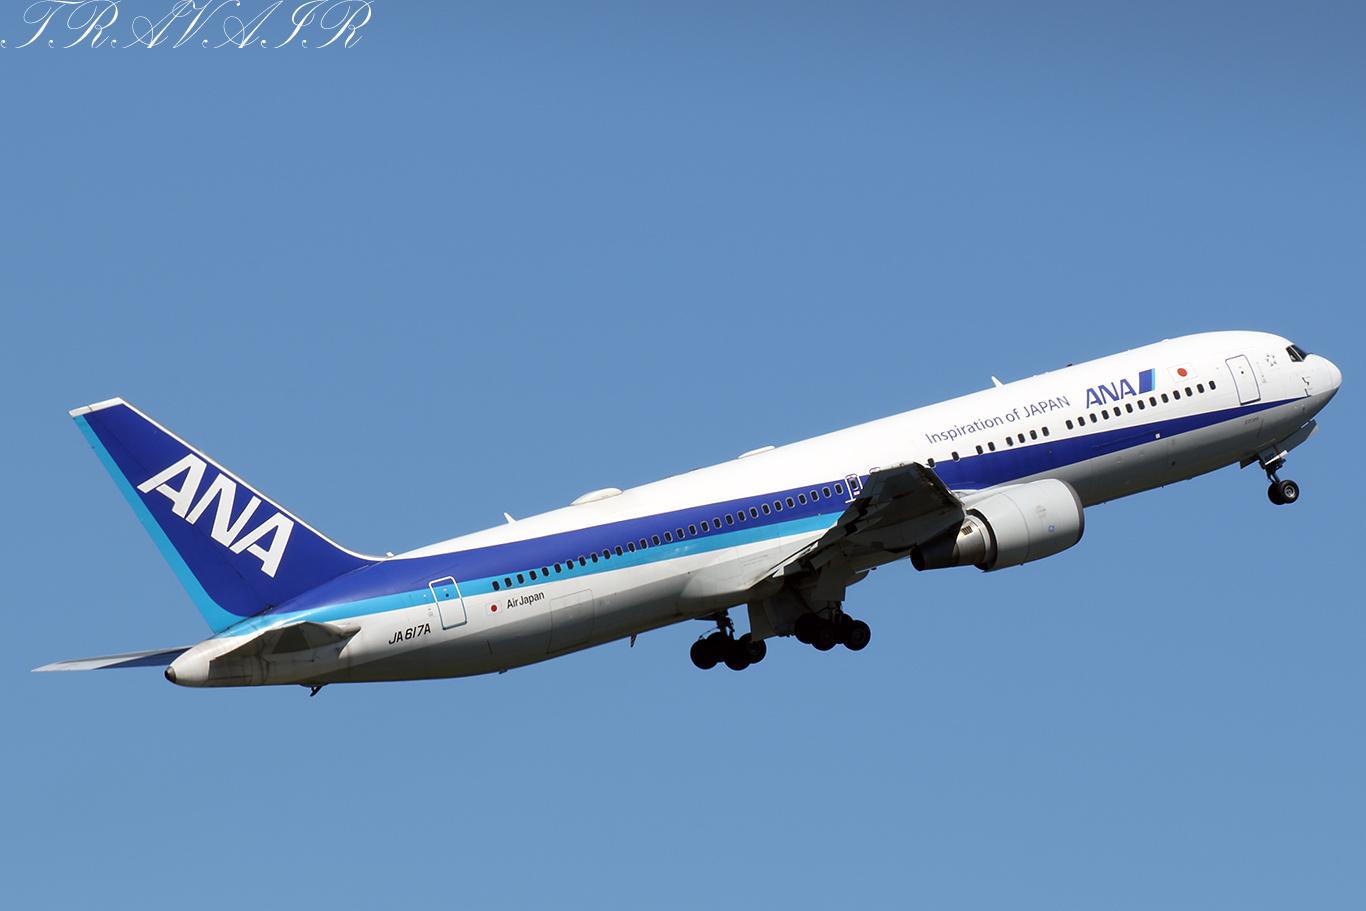 NH/ANA/全日空 NH67 B767-300ER JA617A